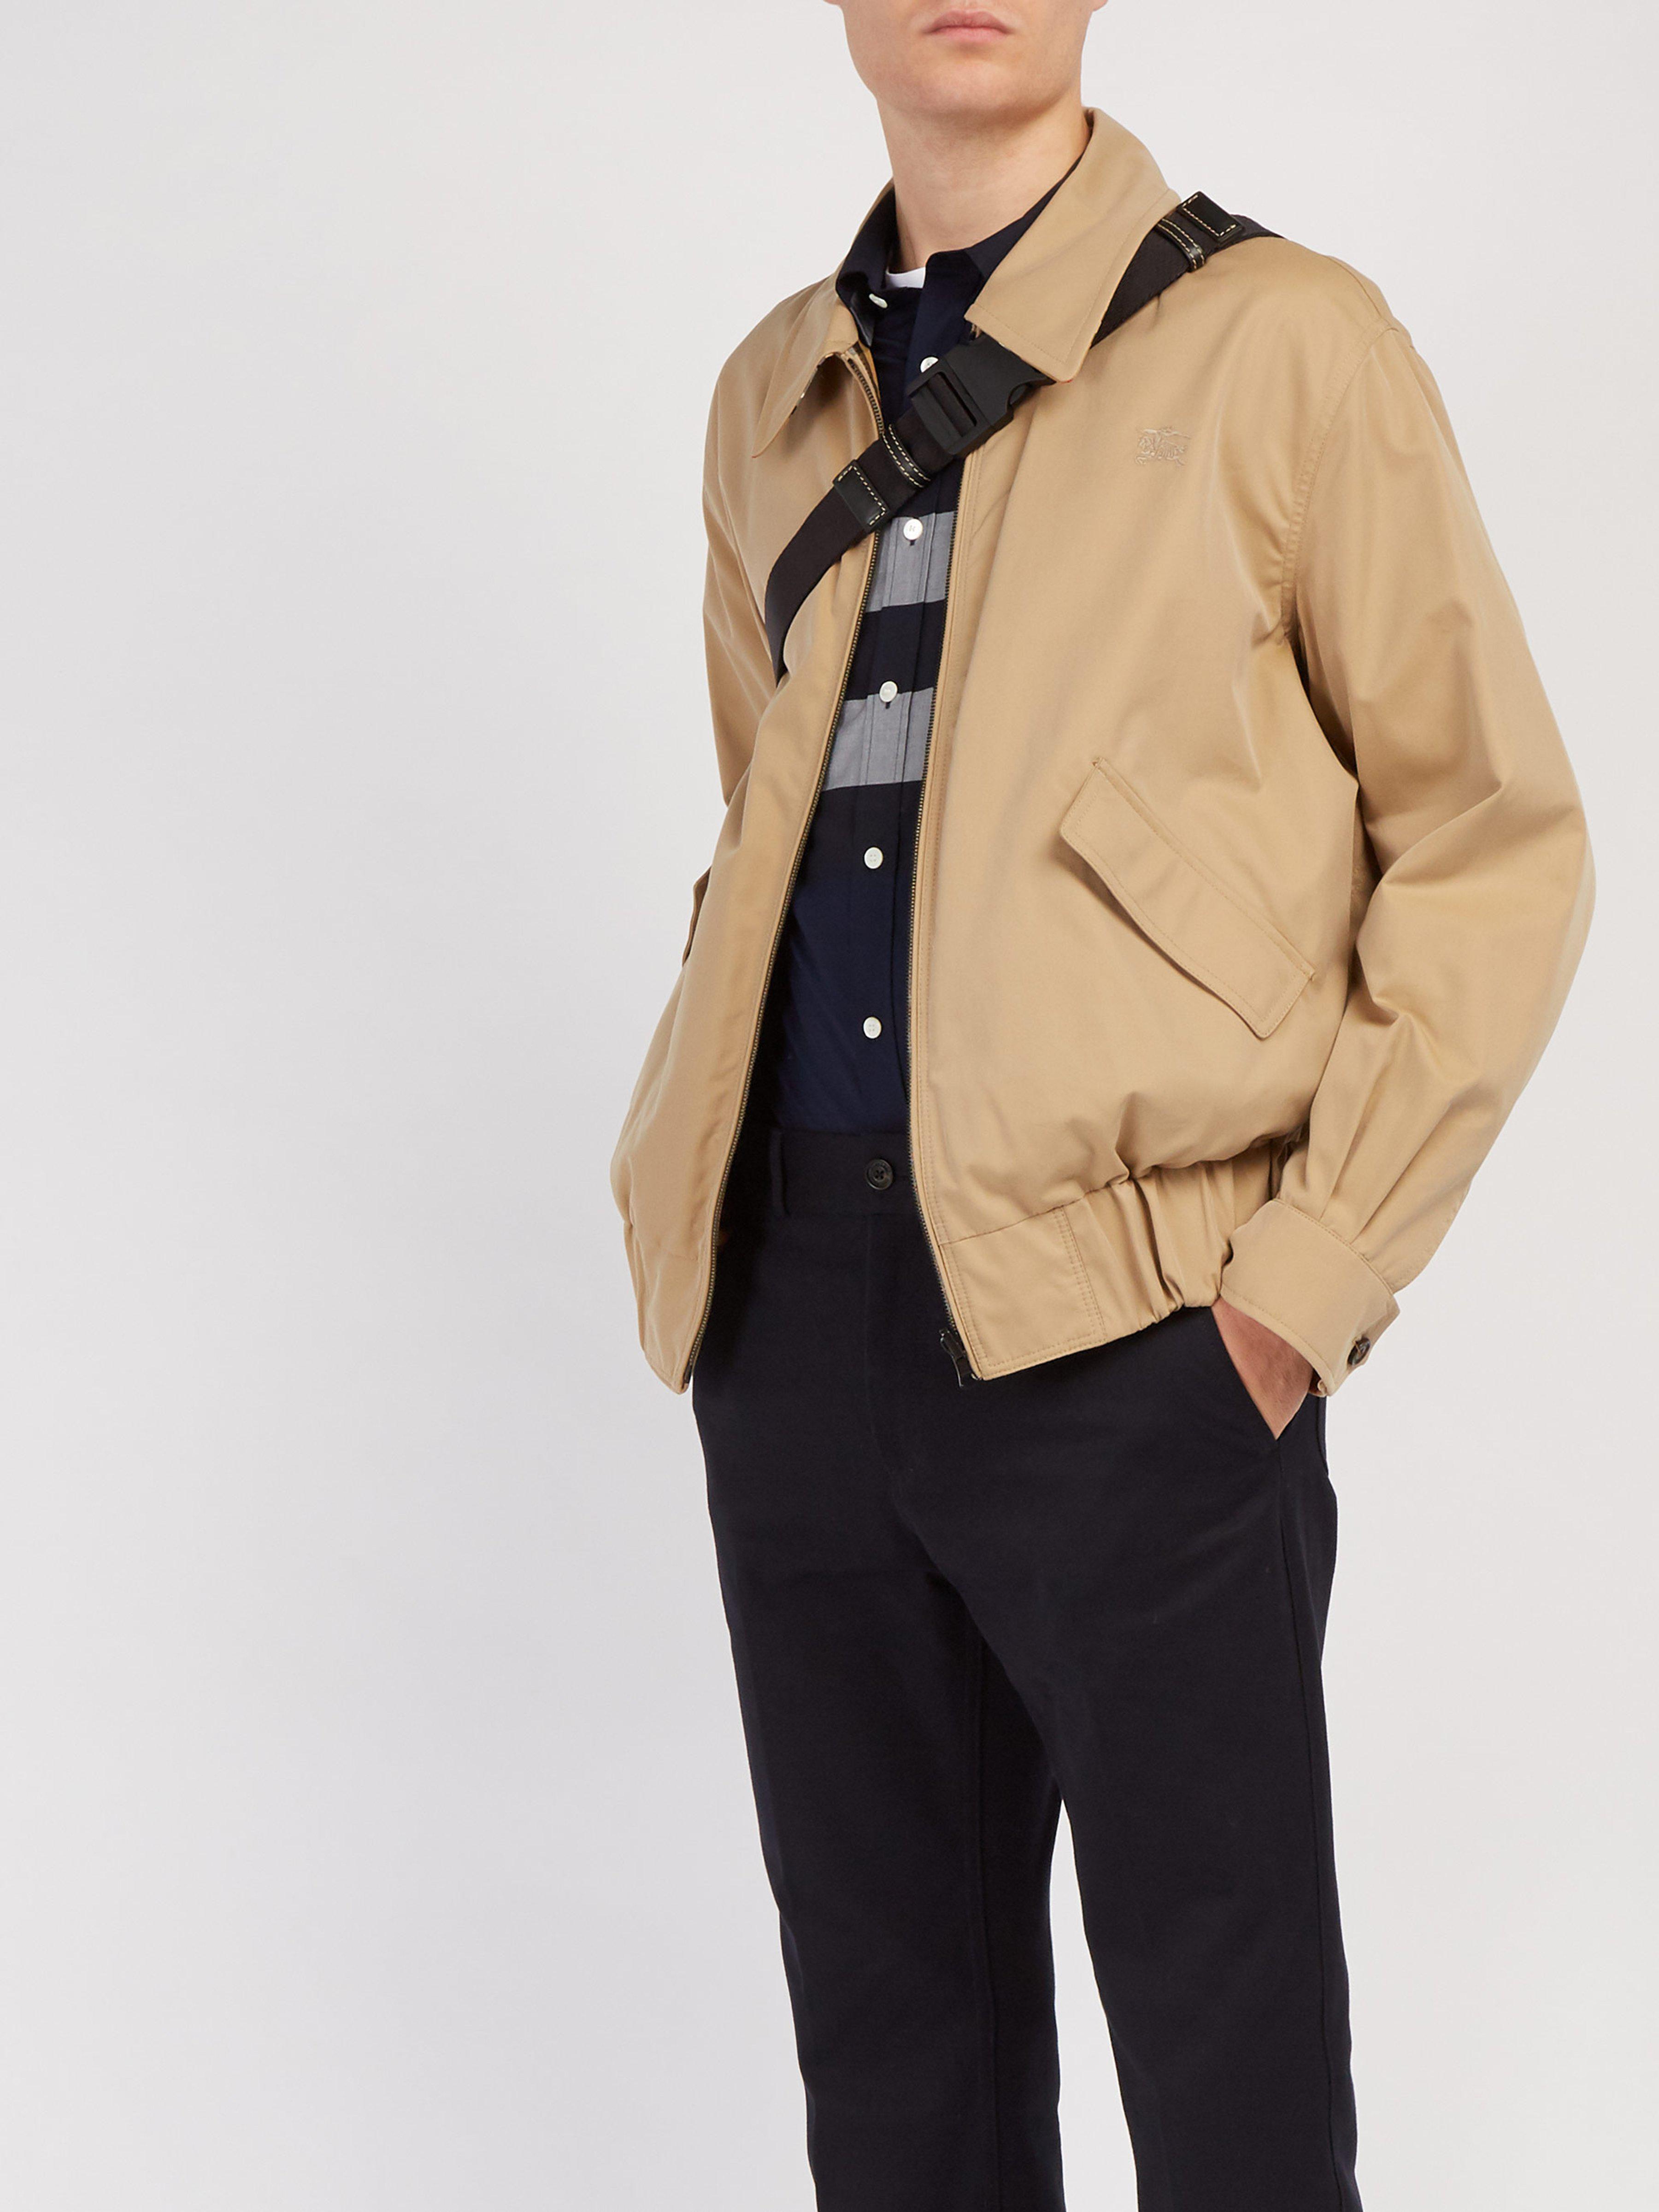 Cotton For Lyst Men Burberry Harrington Jacket Natural View Fullscreen Gabardine 0AxXxEw